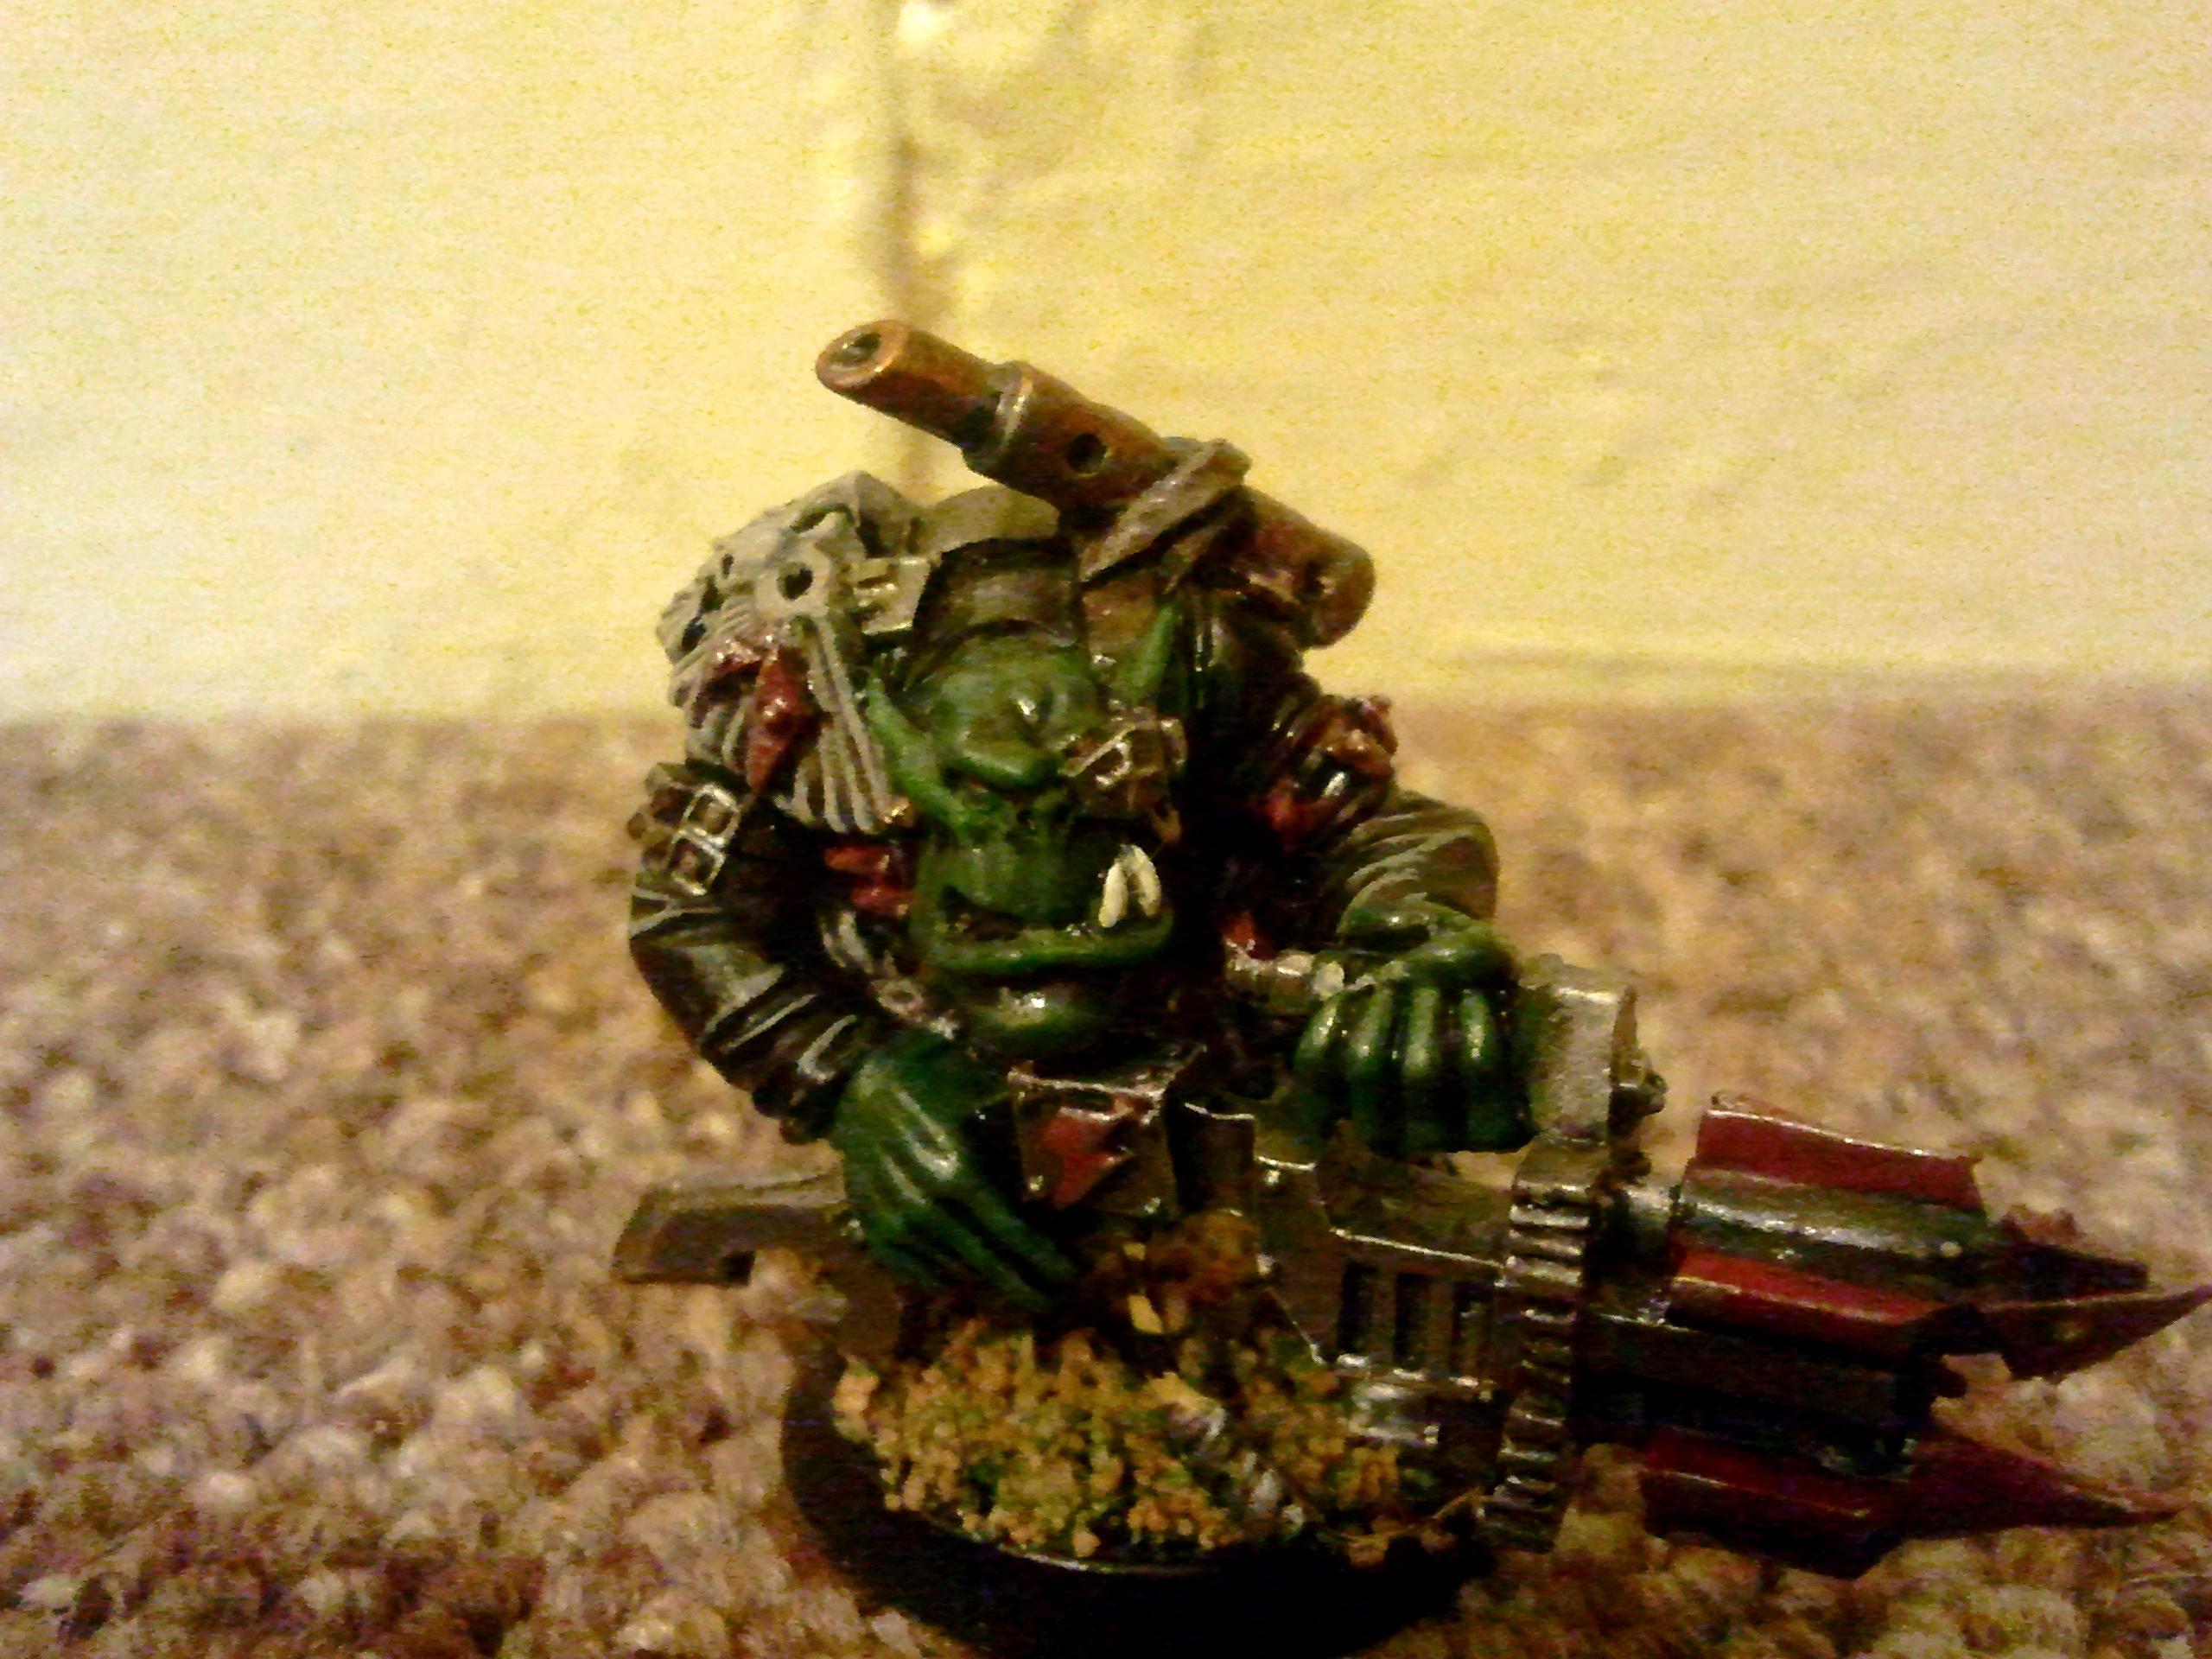 Orks, Space Ork, Tankbustas, Warhammer 40,000